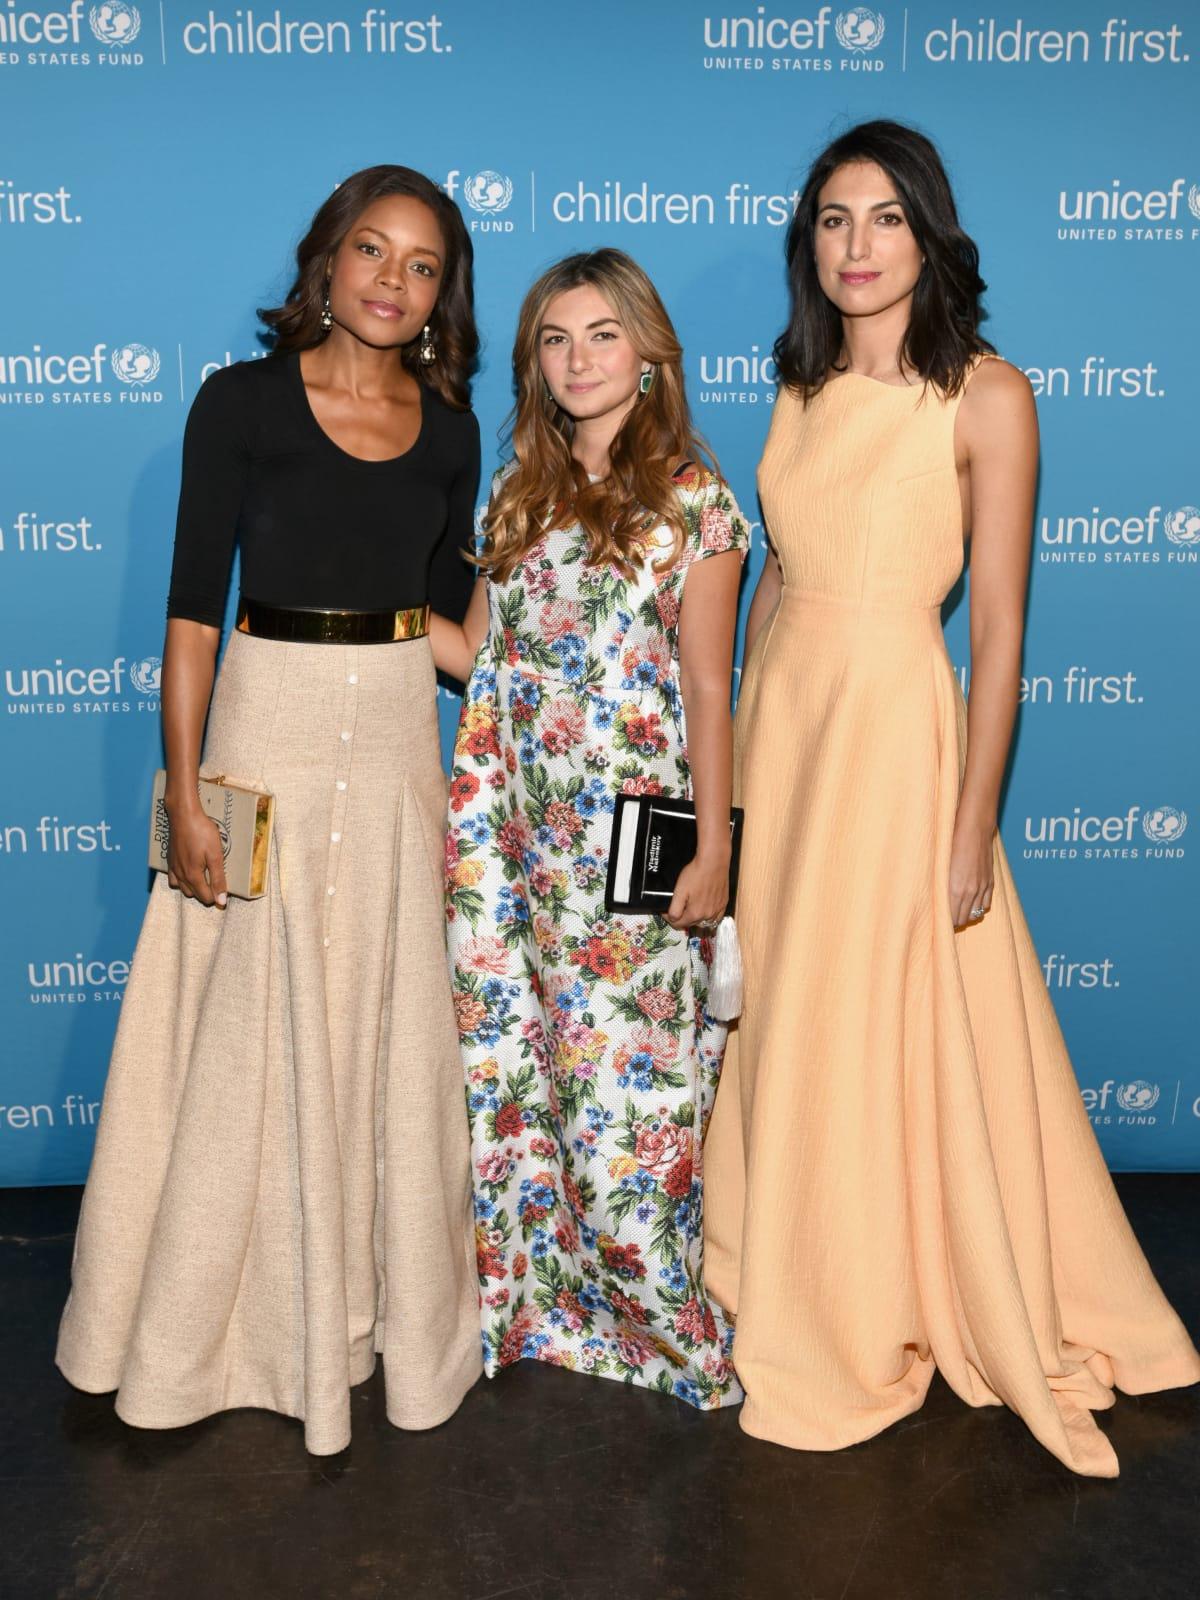 Actress Naomie Harris, Nasiba Adilova, Federica Fanari